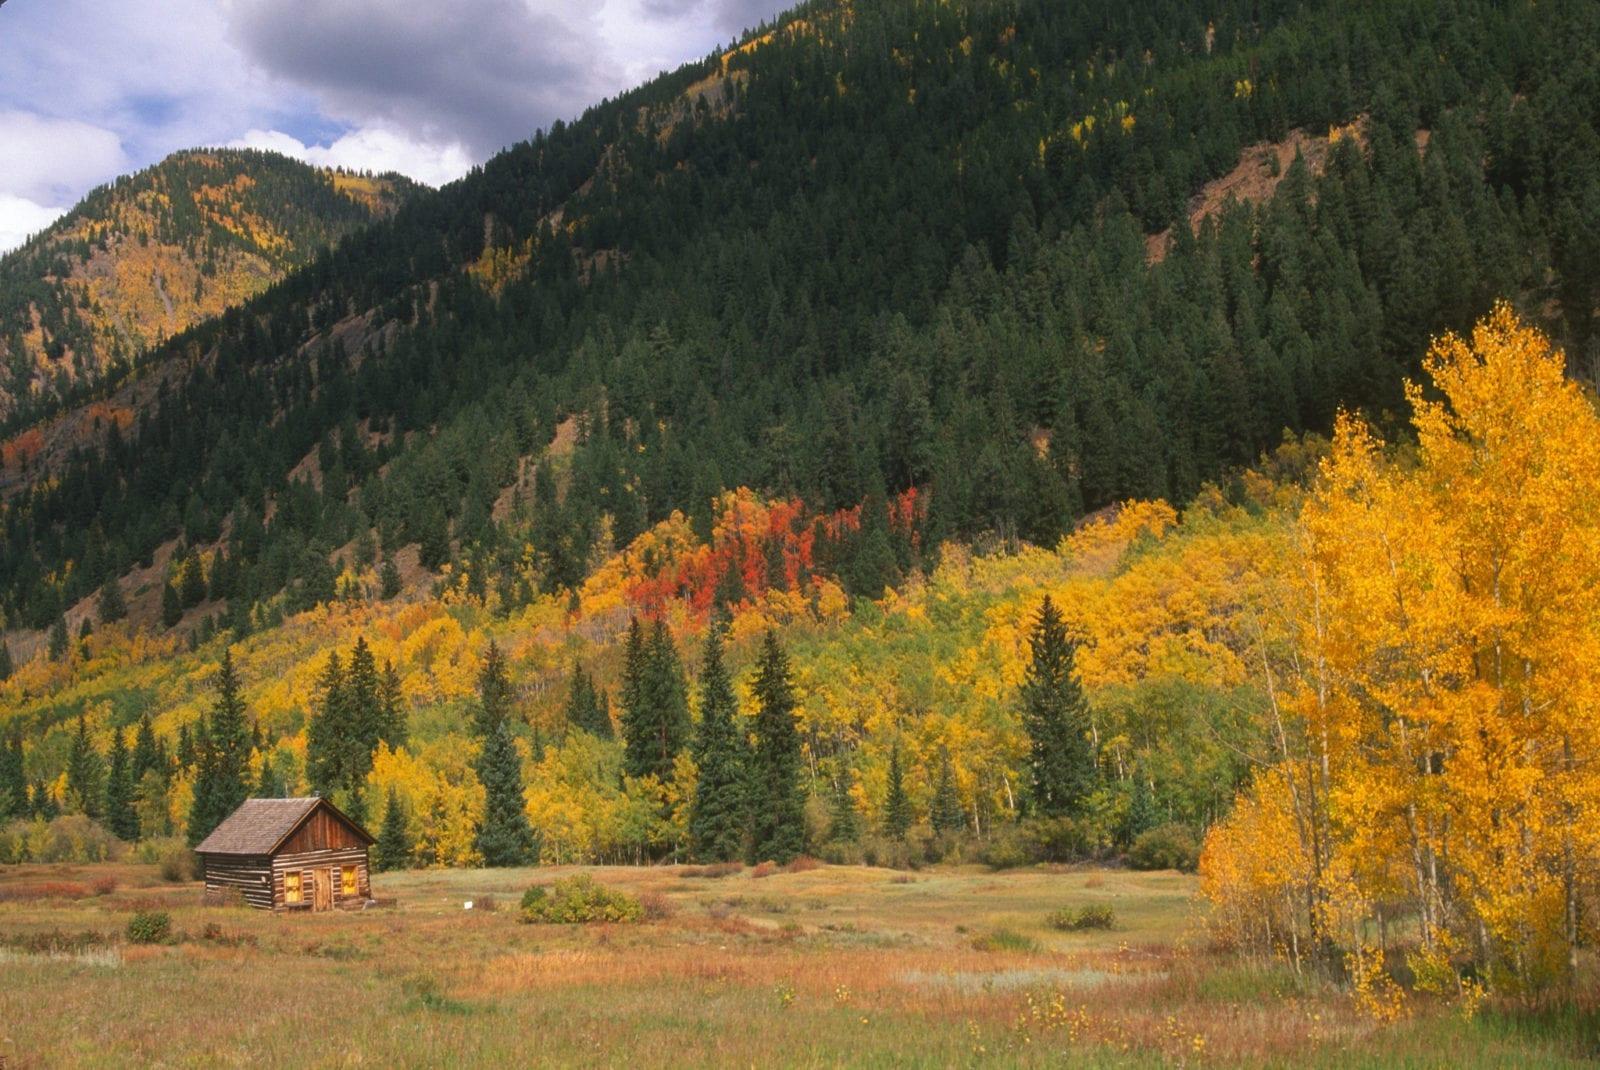 image of fall colors at Sylvan Lake State Park